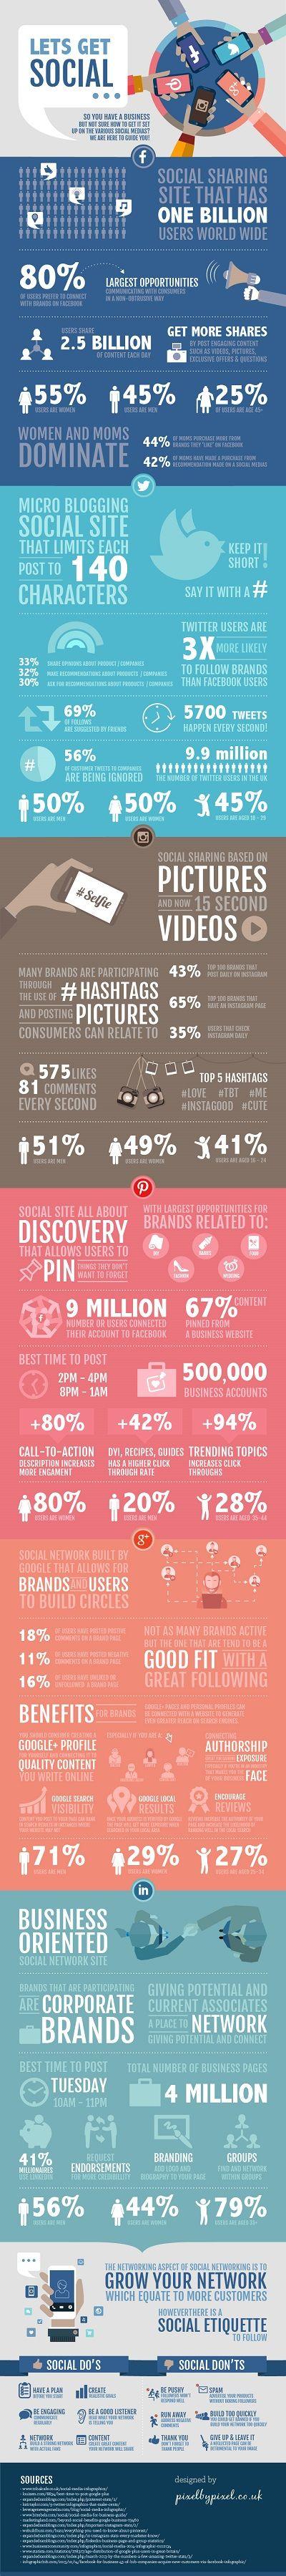 Social -media -infographic